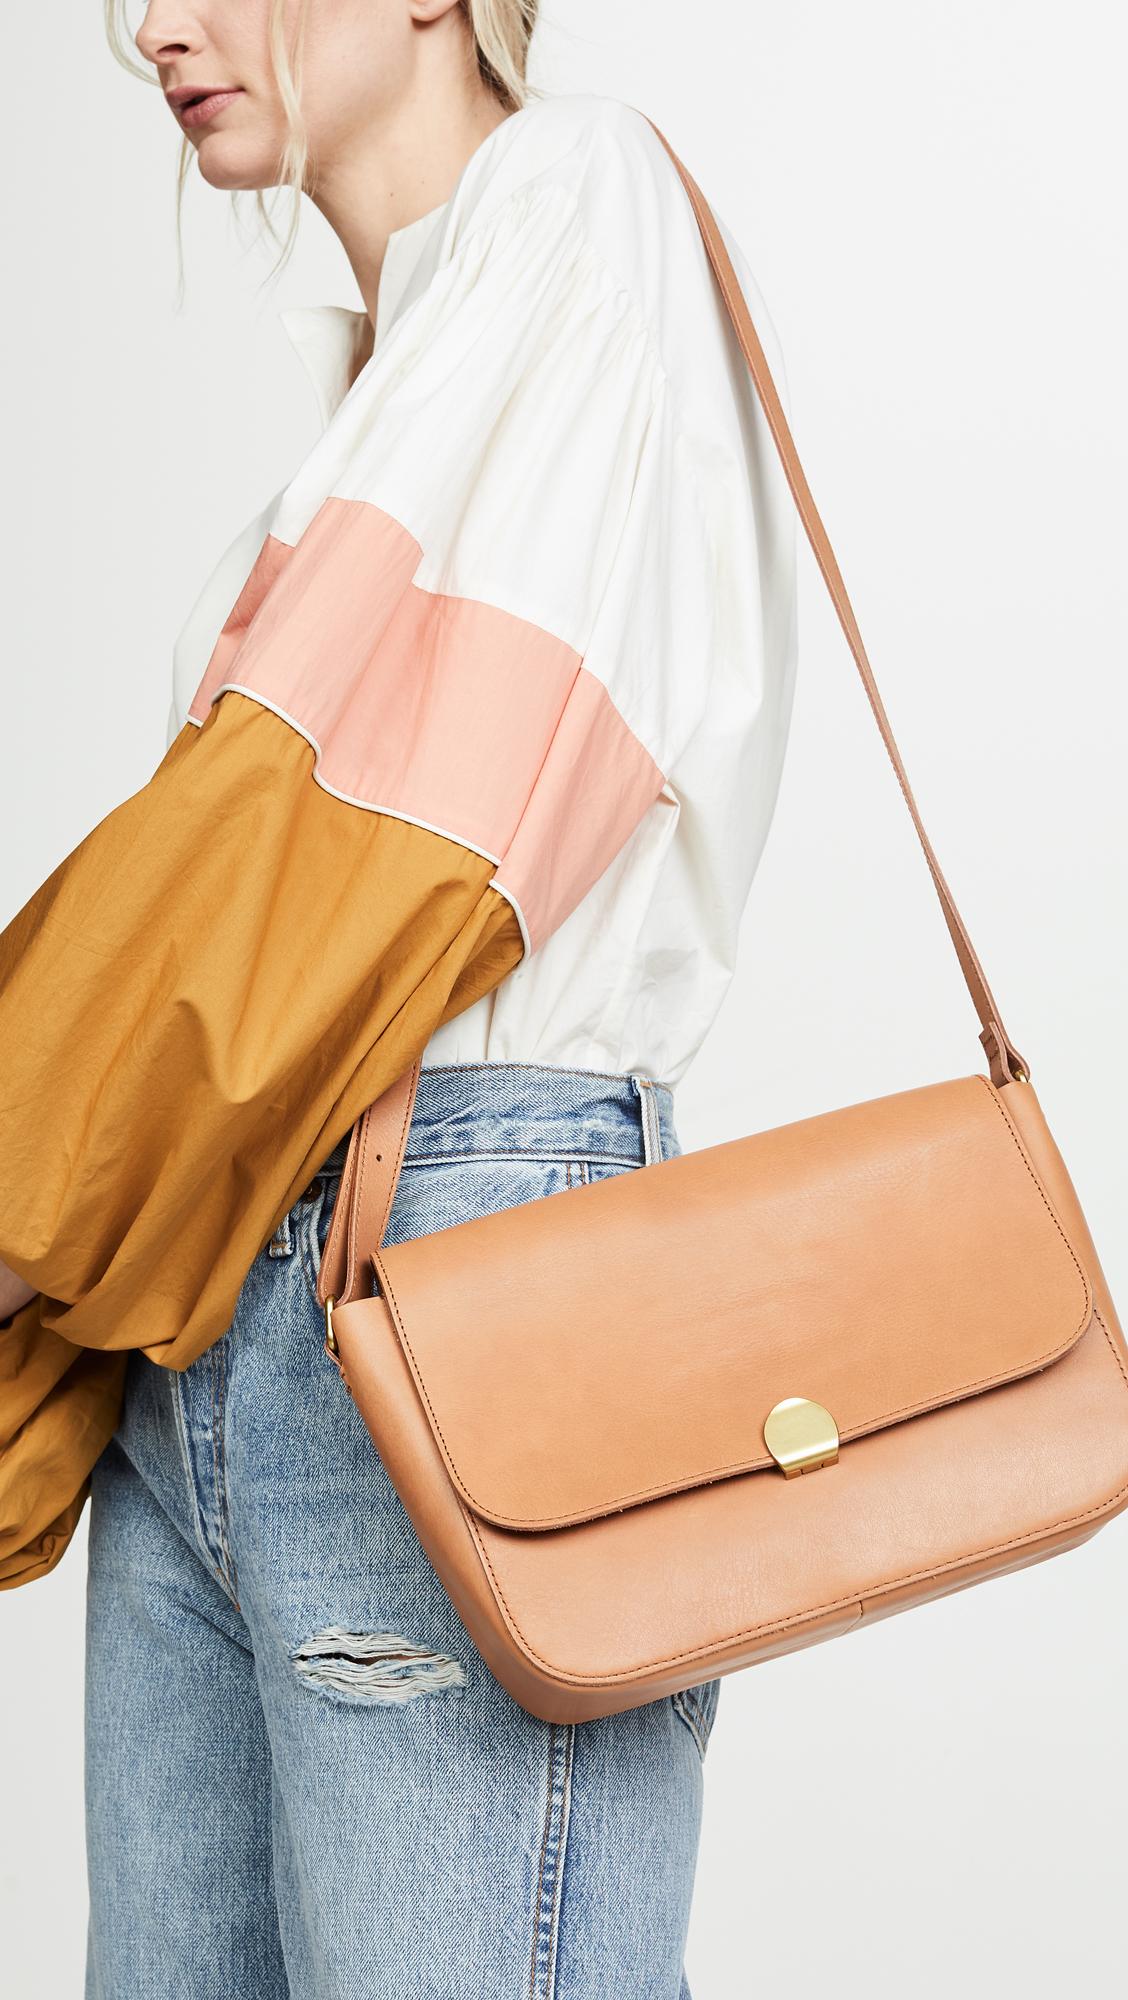 d5b0e8cd5 Madewell The Abroad Shoulder Bag